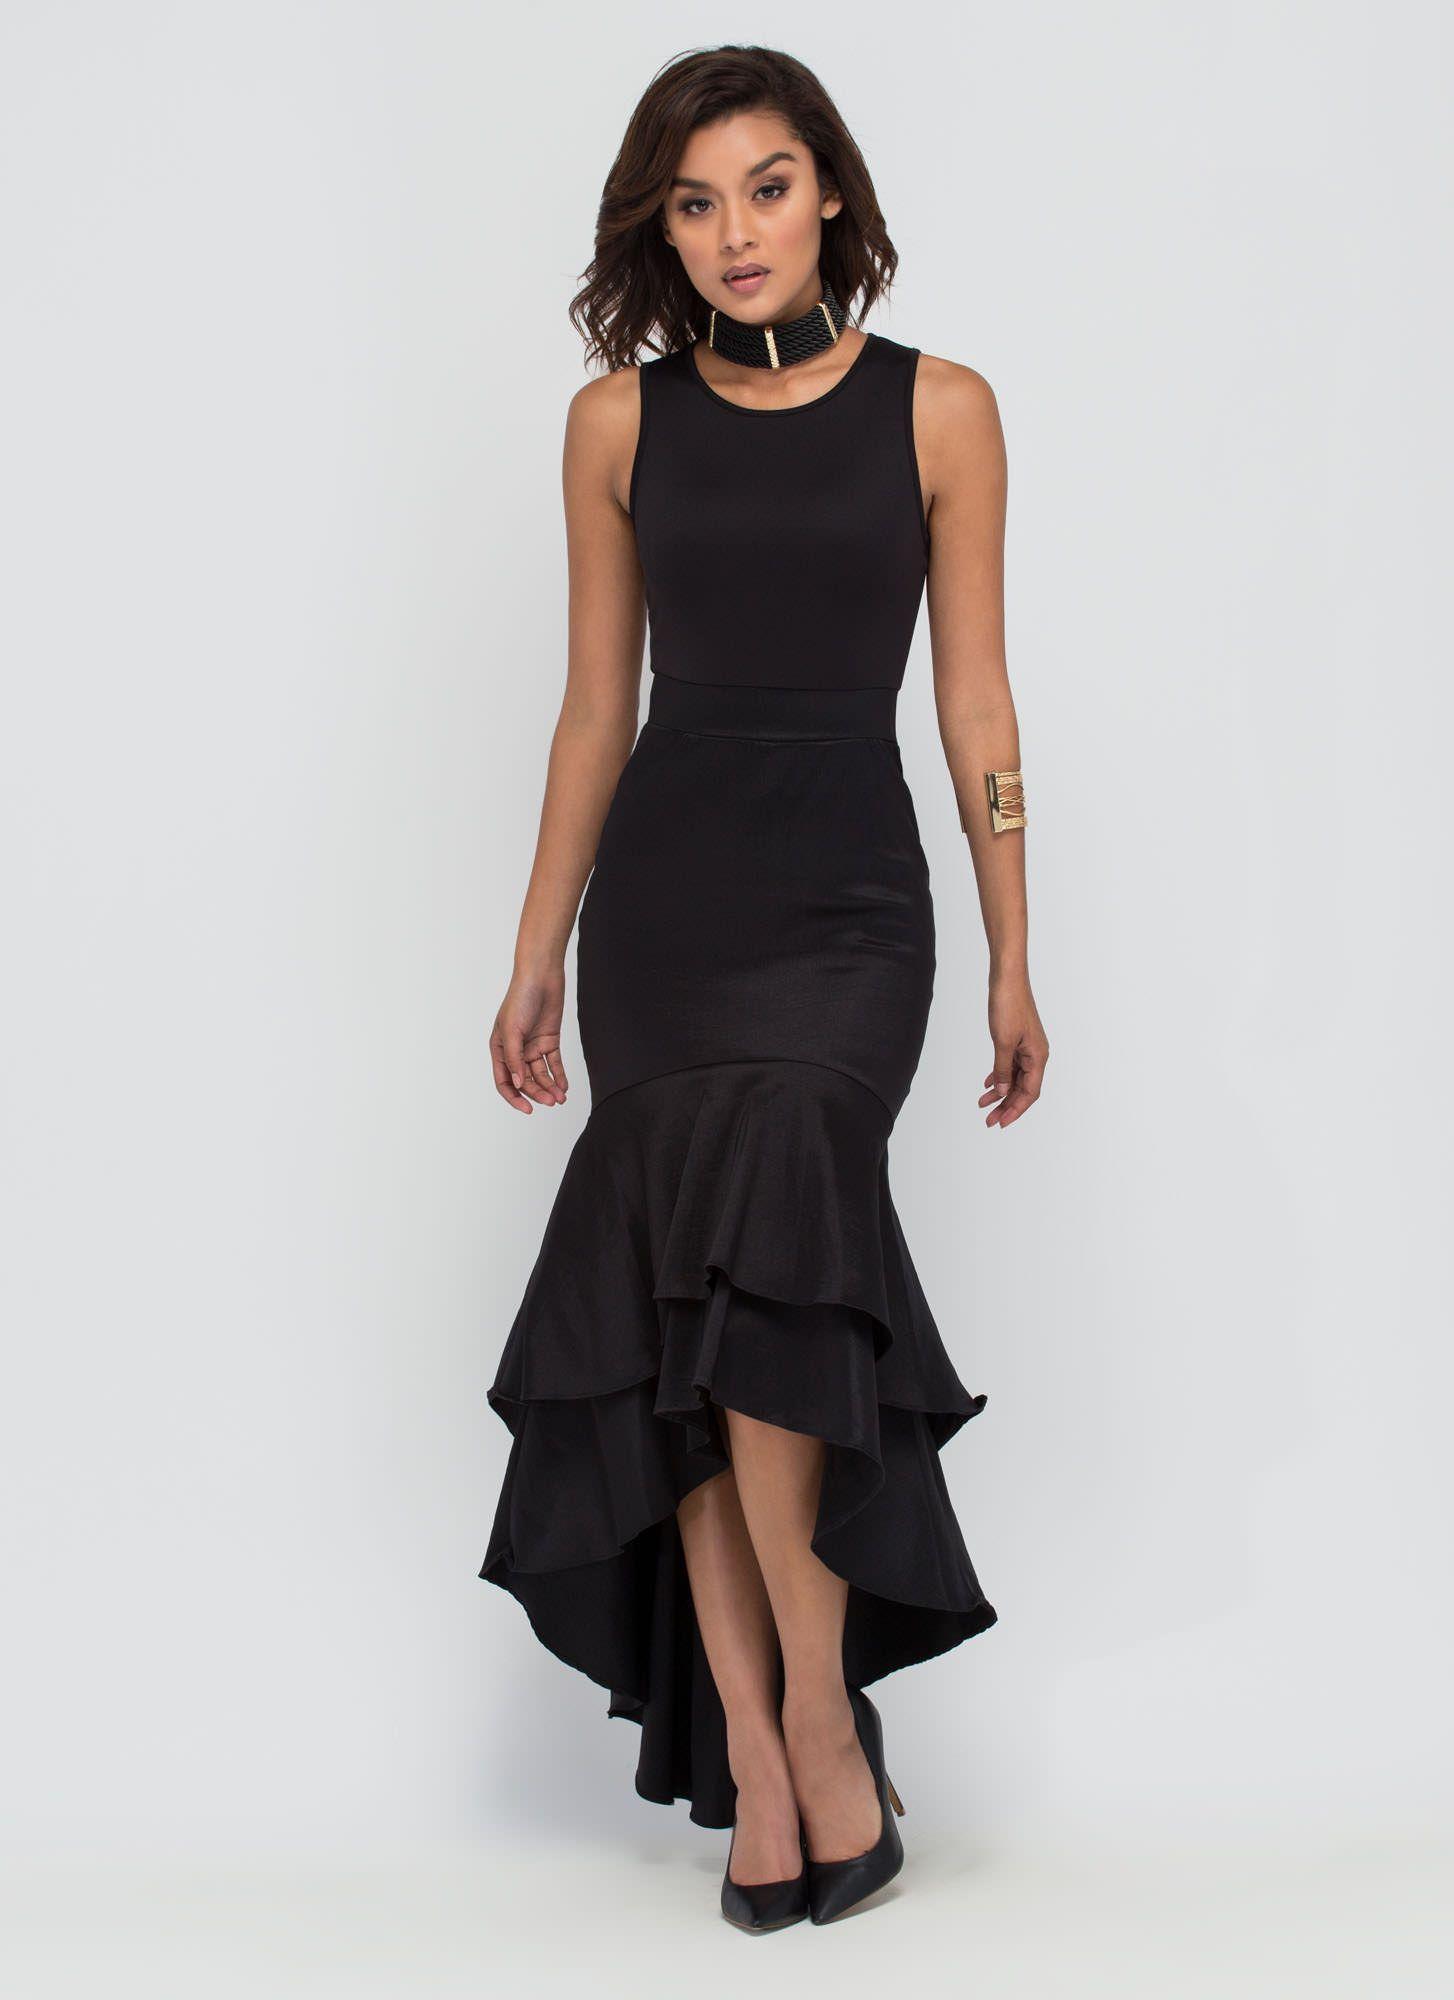 Standing Ovation High Low Mermaid Dress Black White Dresses Black Dress Dress Skirt [ 2000 x 1454 Pixel ]